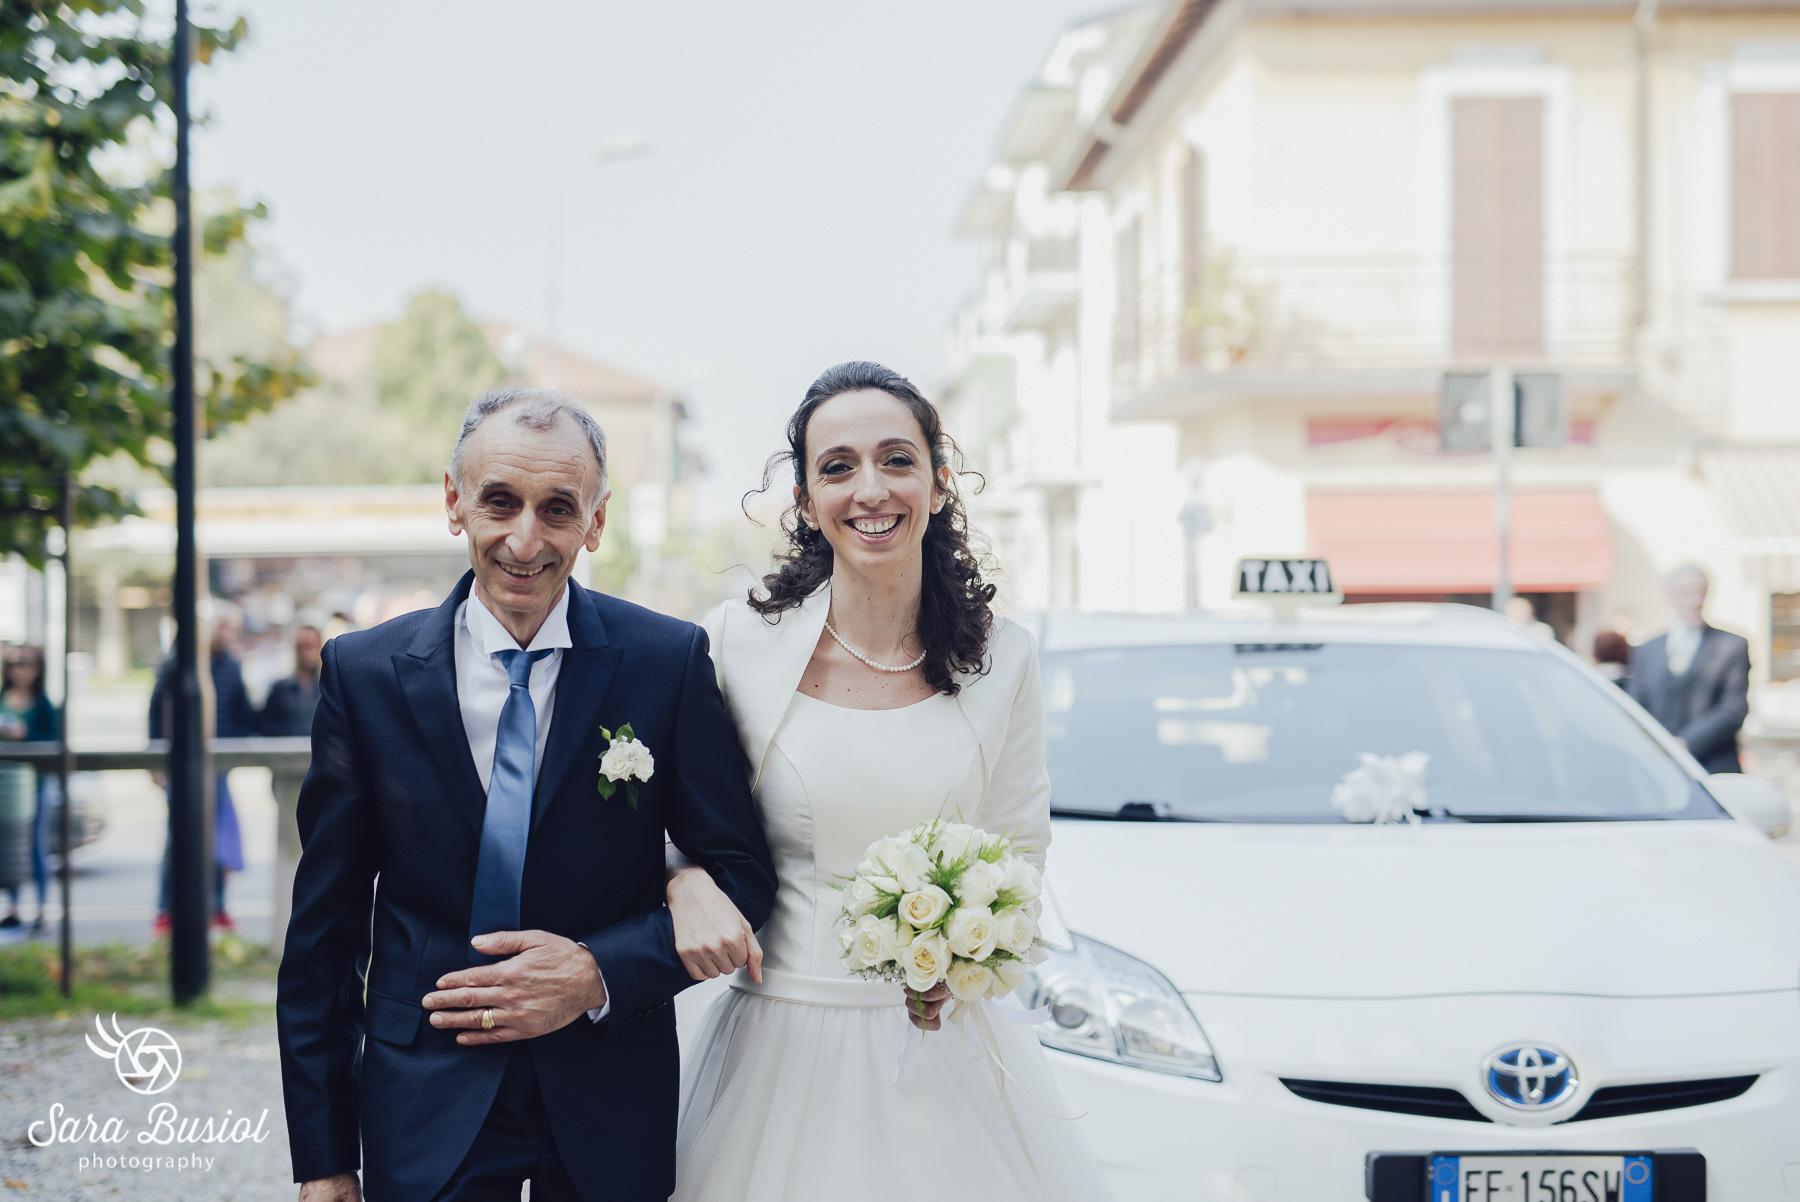 Simona&Gabriele 263